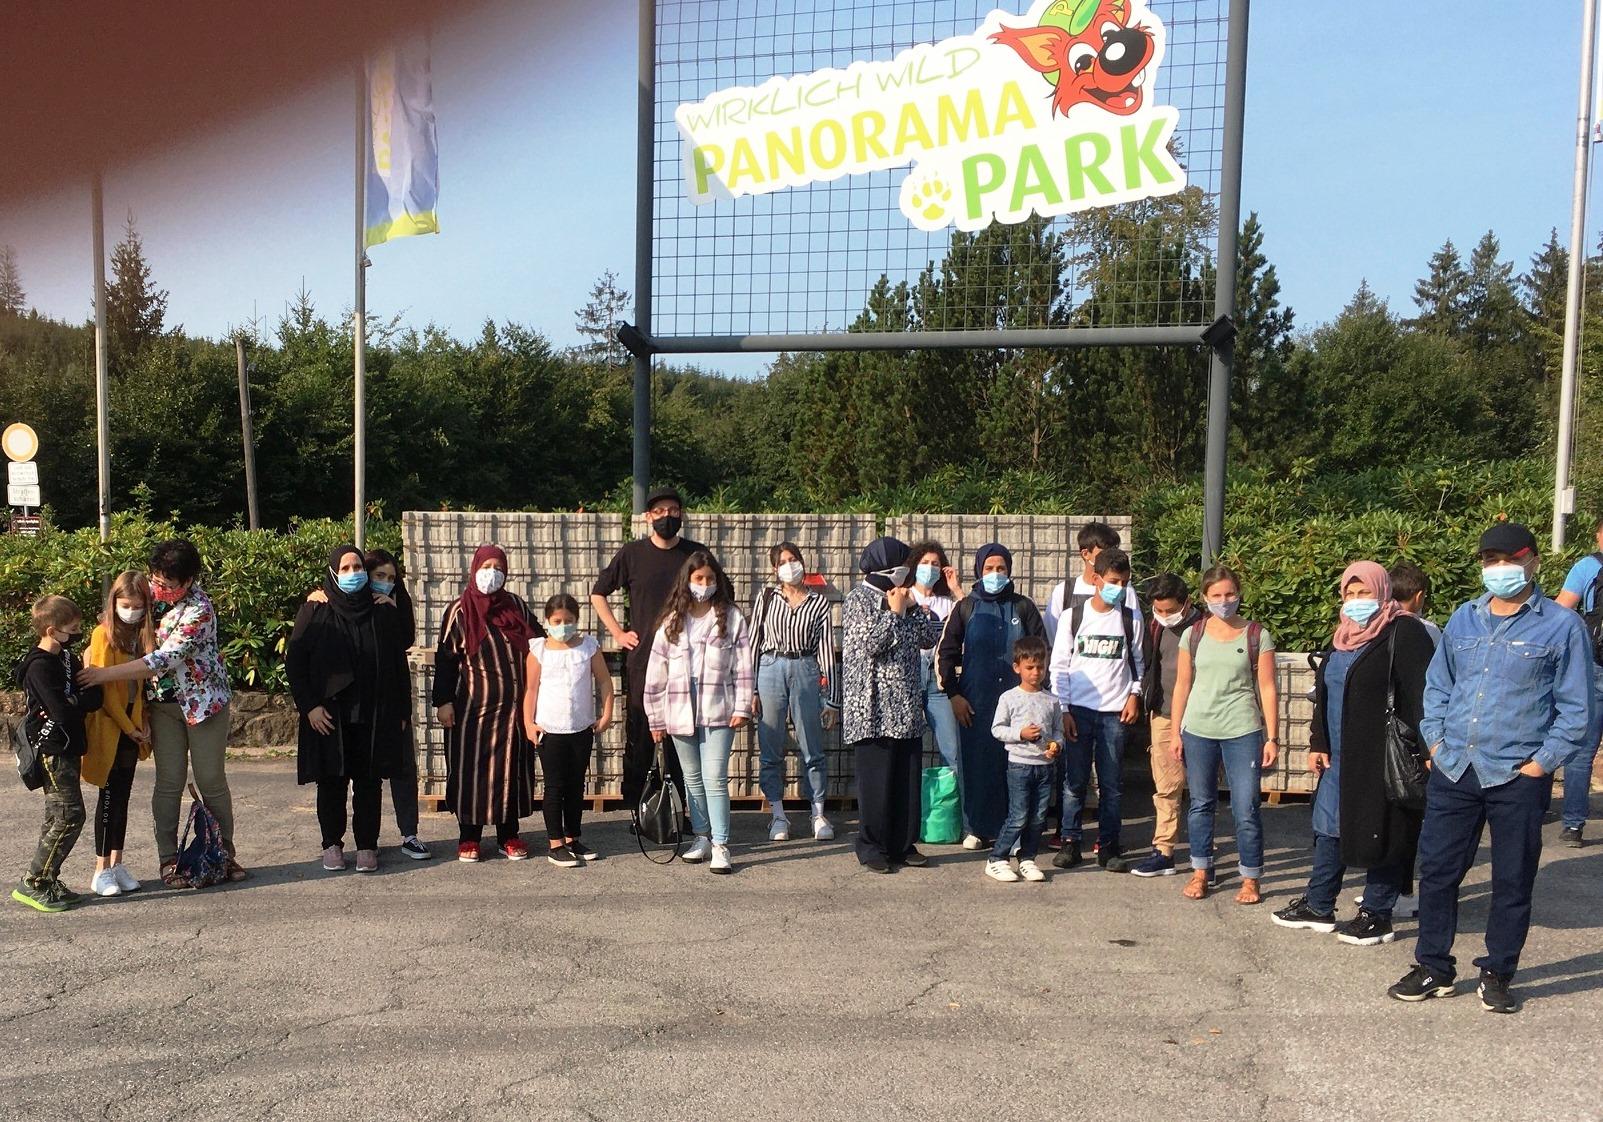 Familienausflug zum Panoramapark